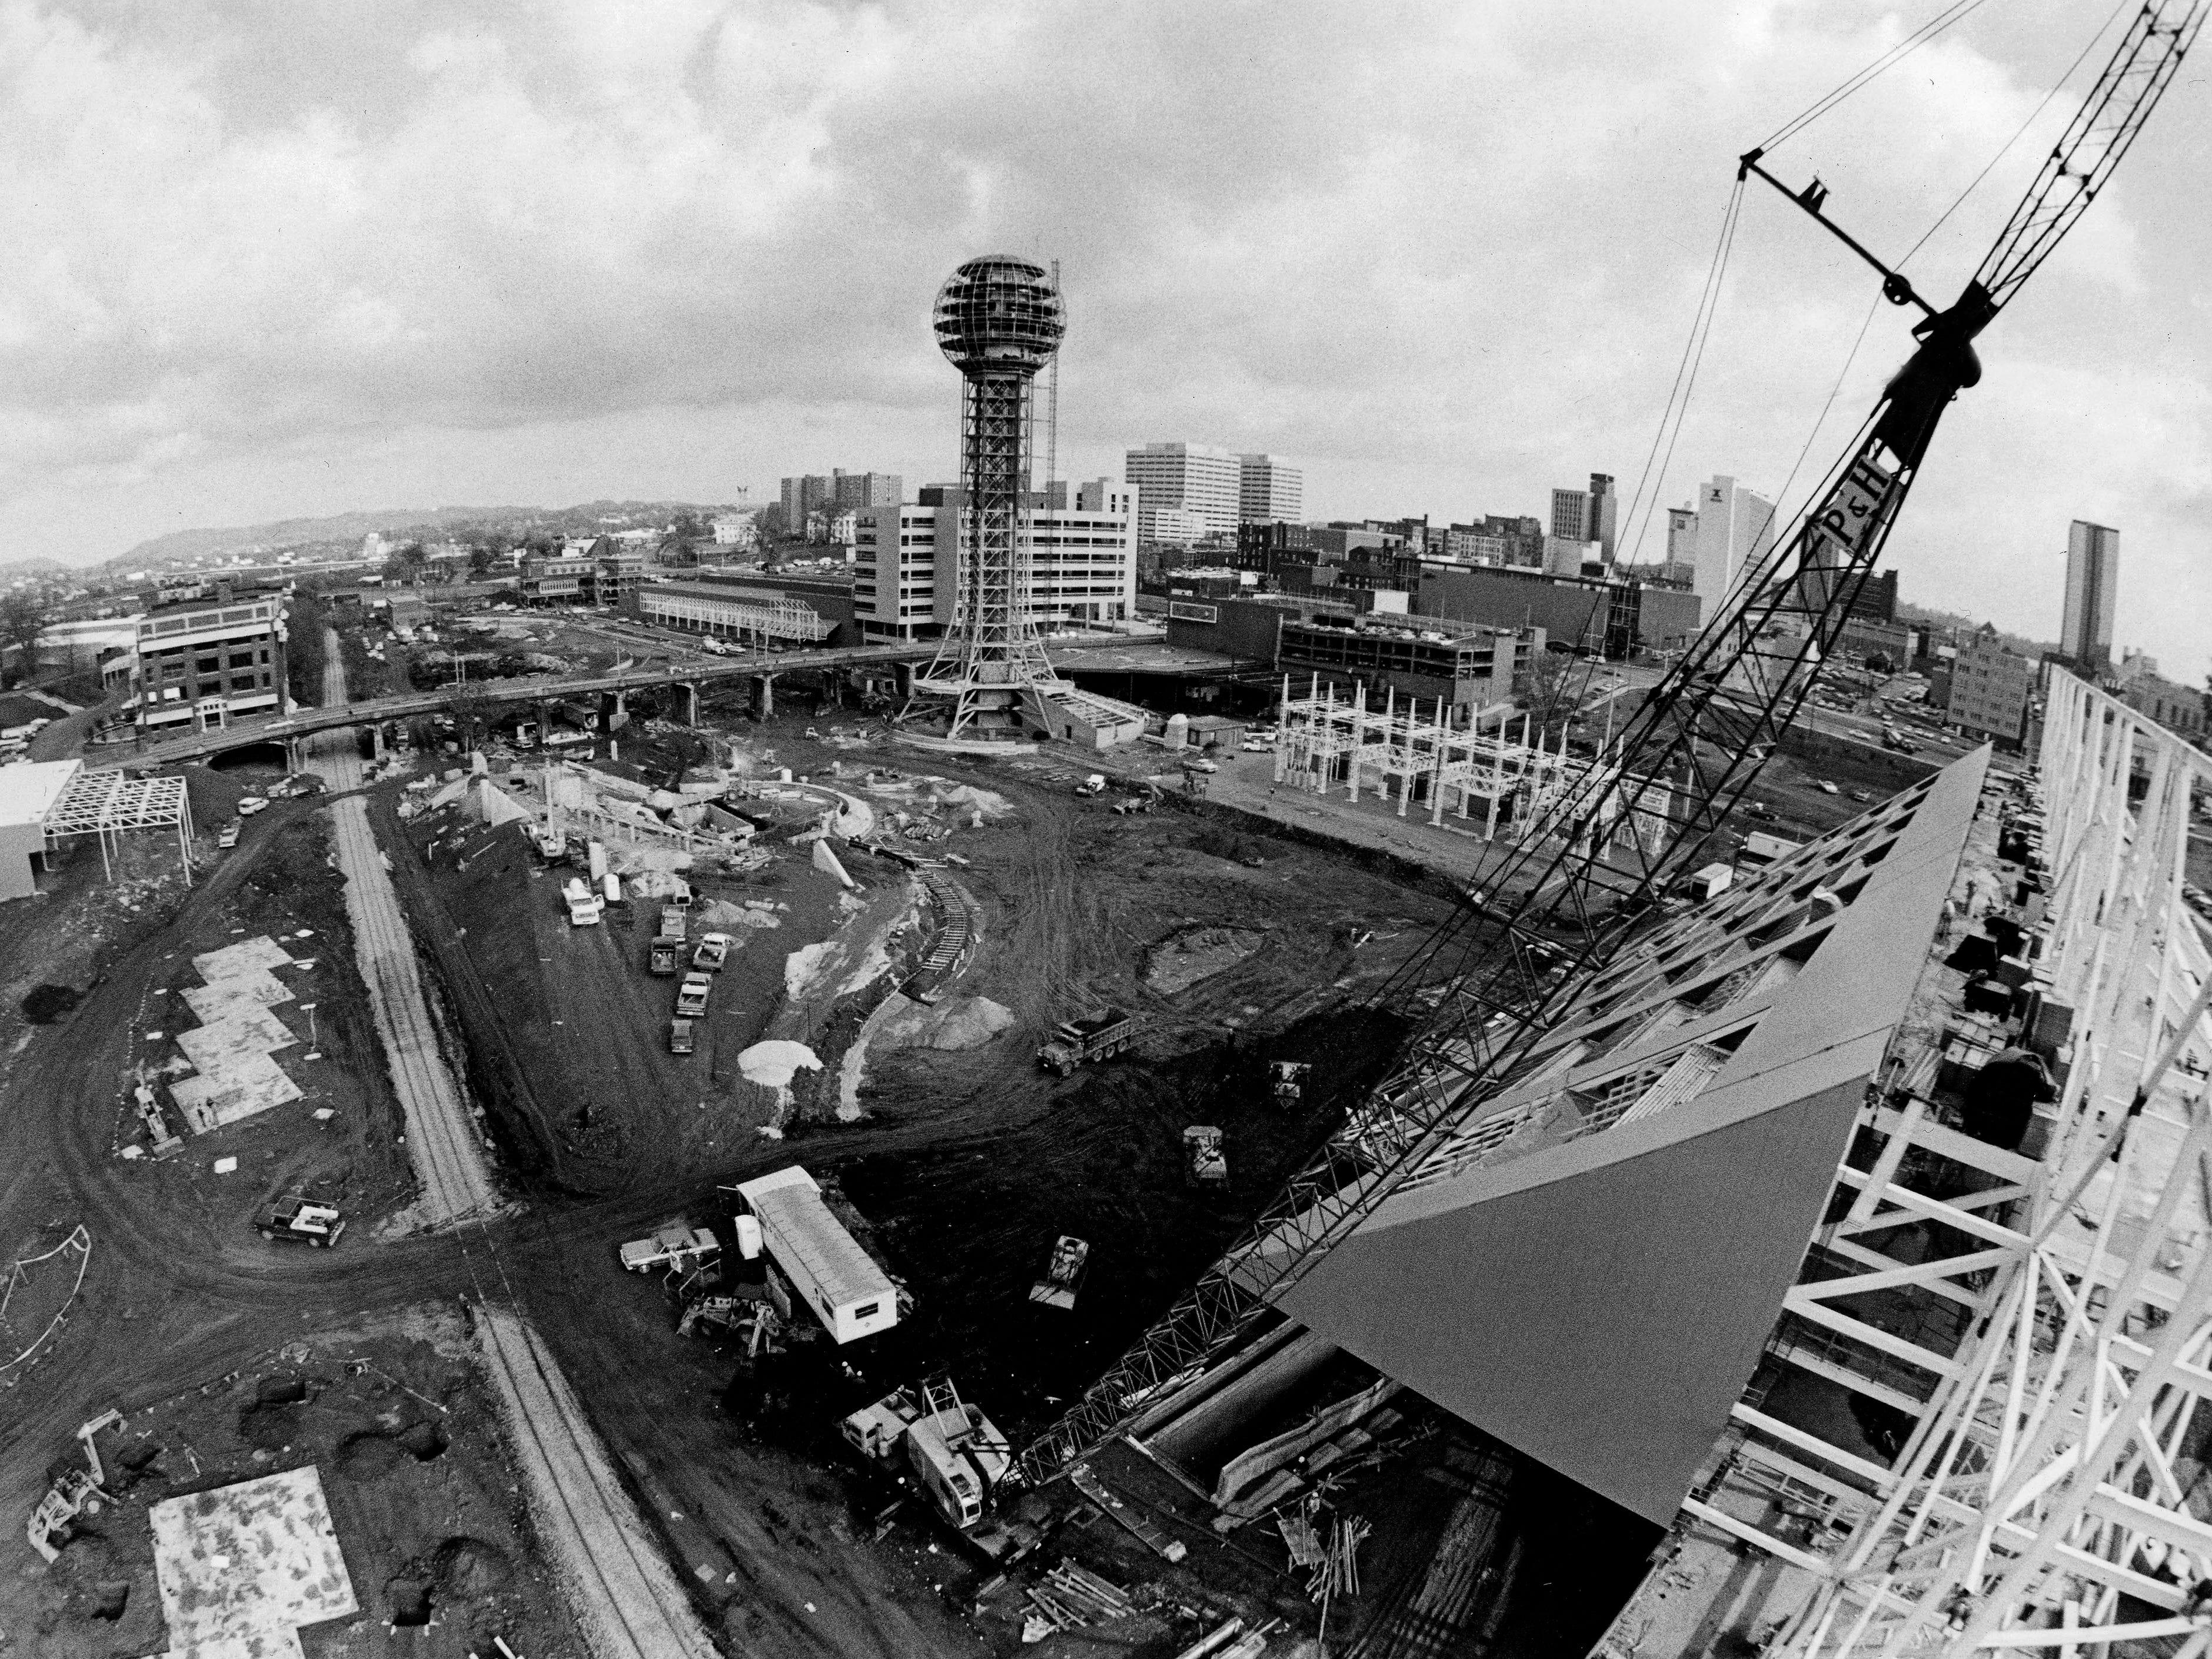 The World's Fair Park is seen under construction on December 13, 1981.